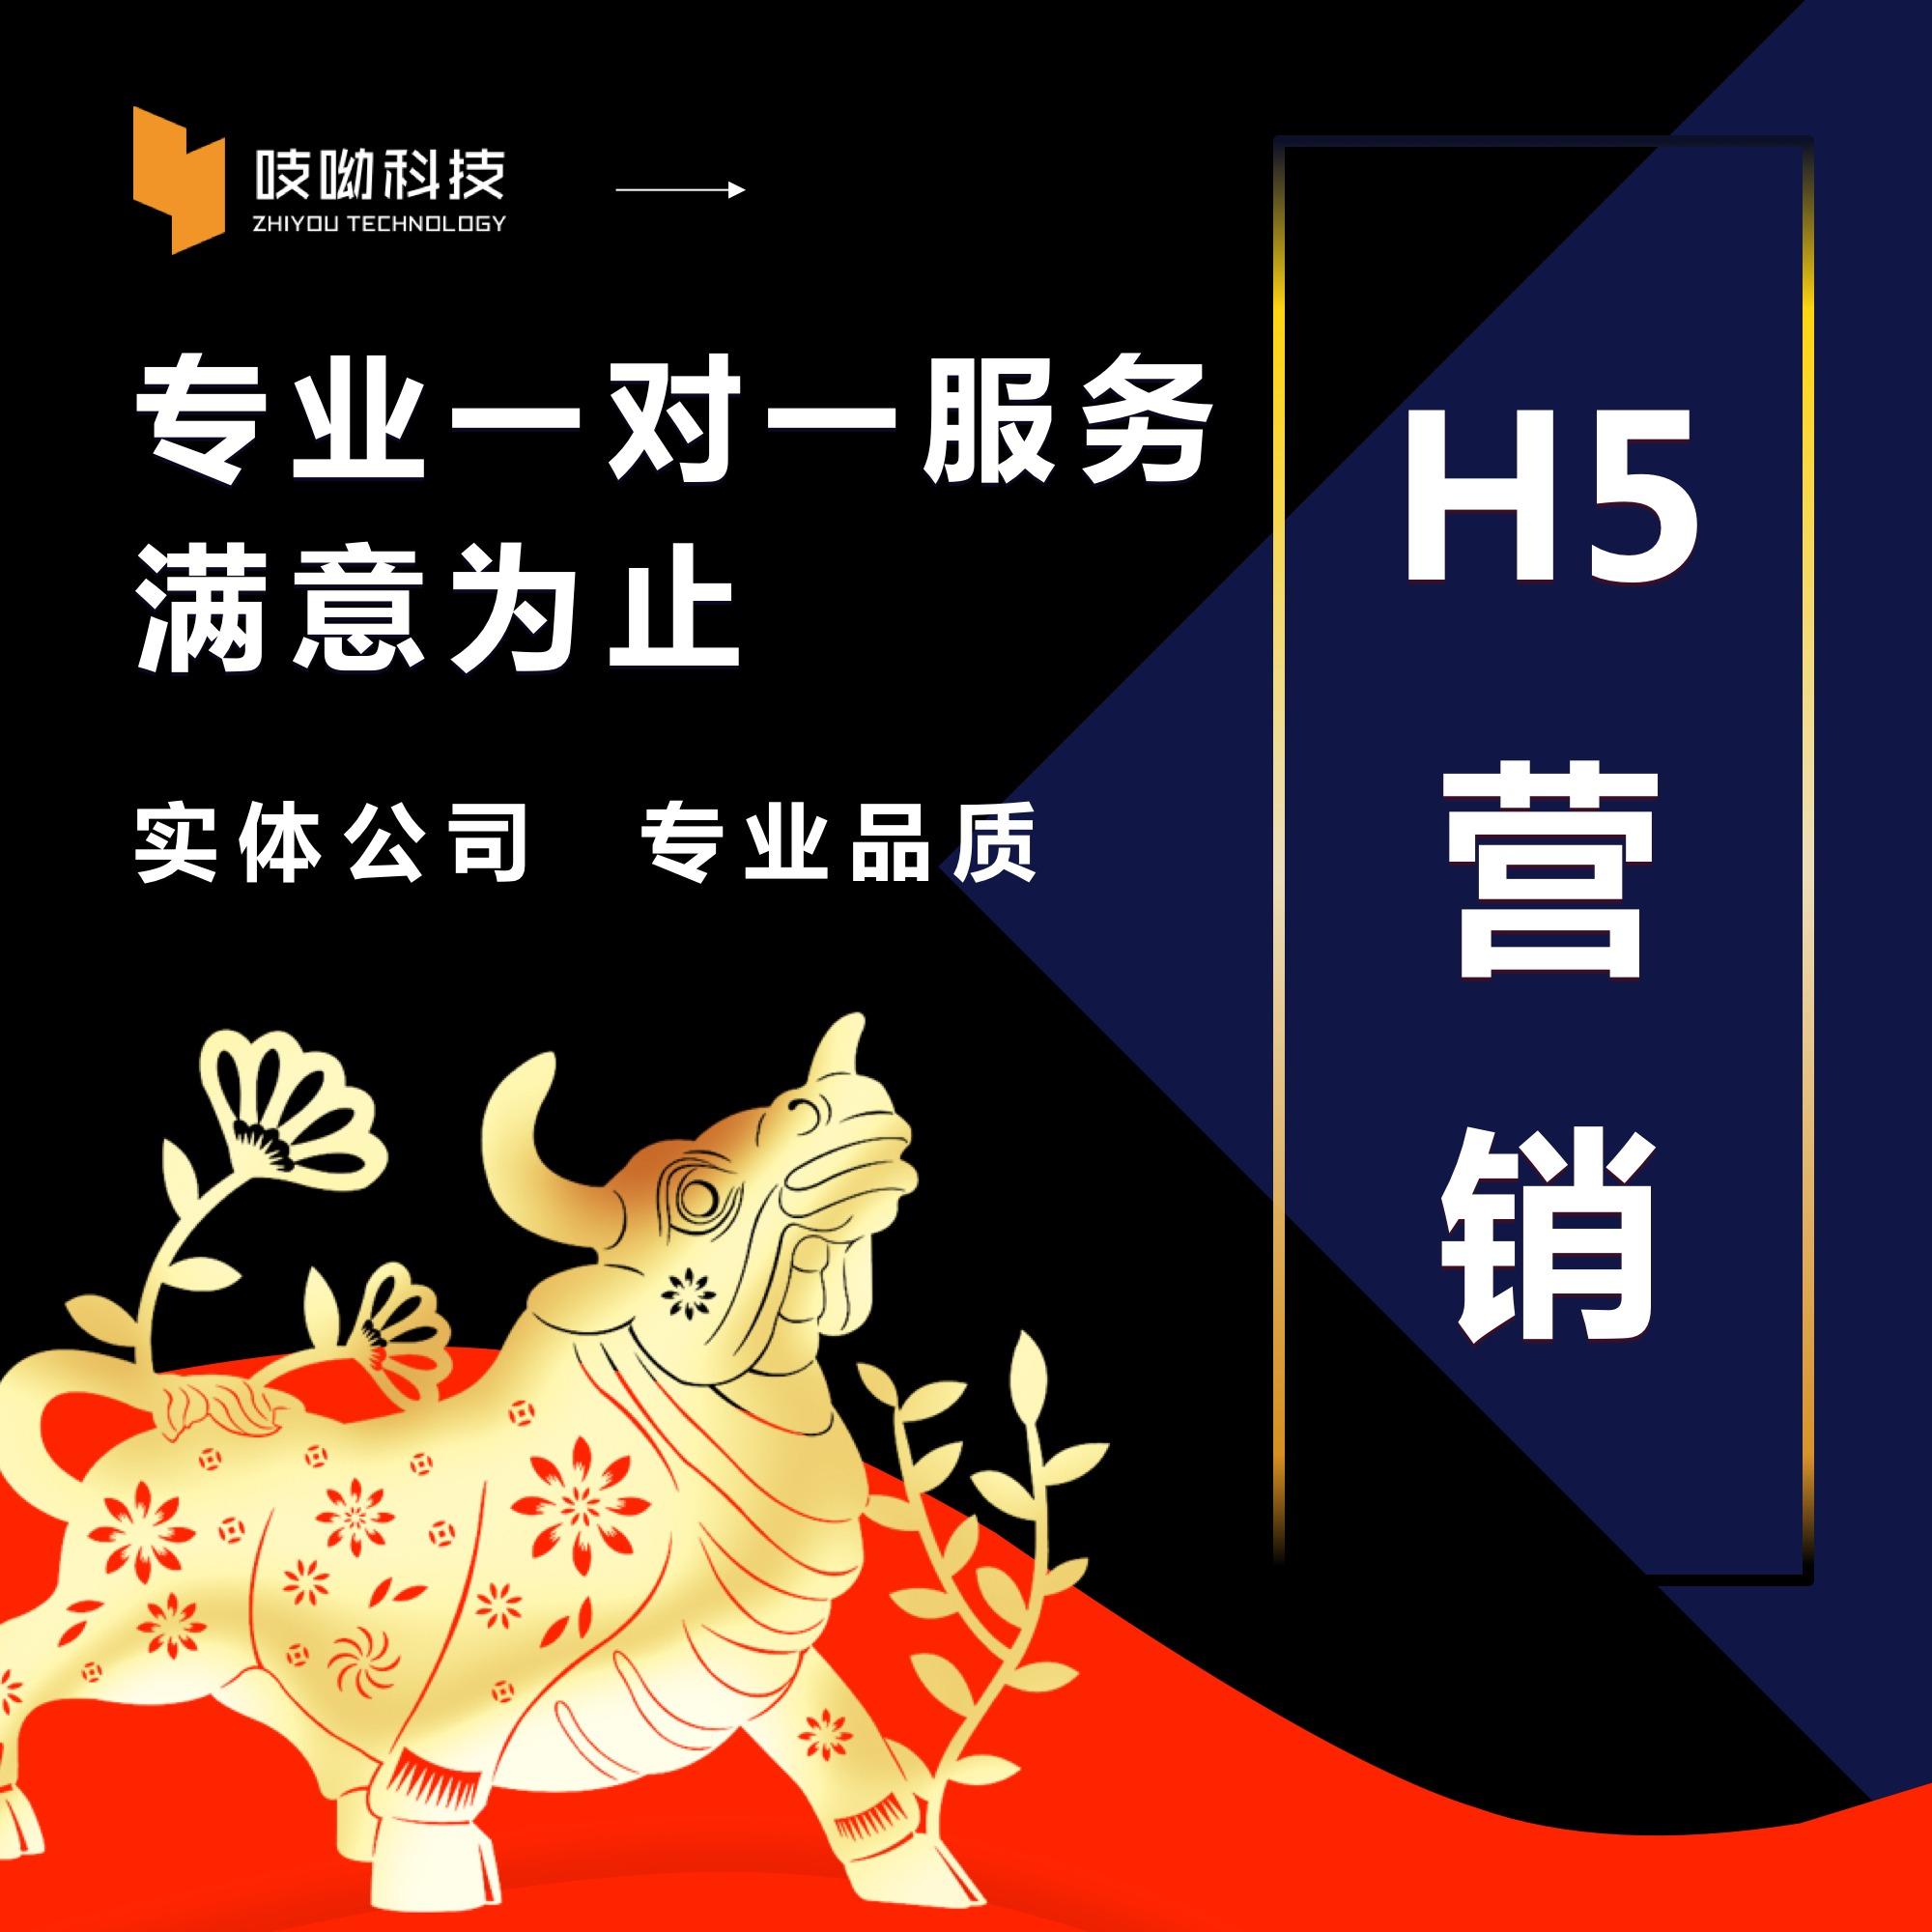 H5模板非定制化活动营销展示节日个人促销培训品牌活动制作开发